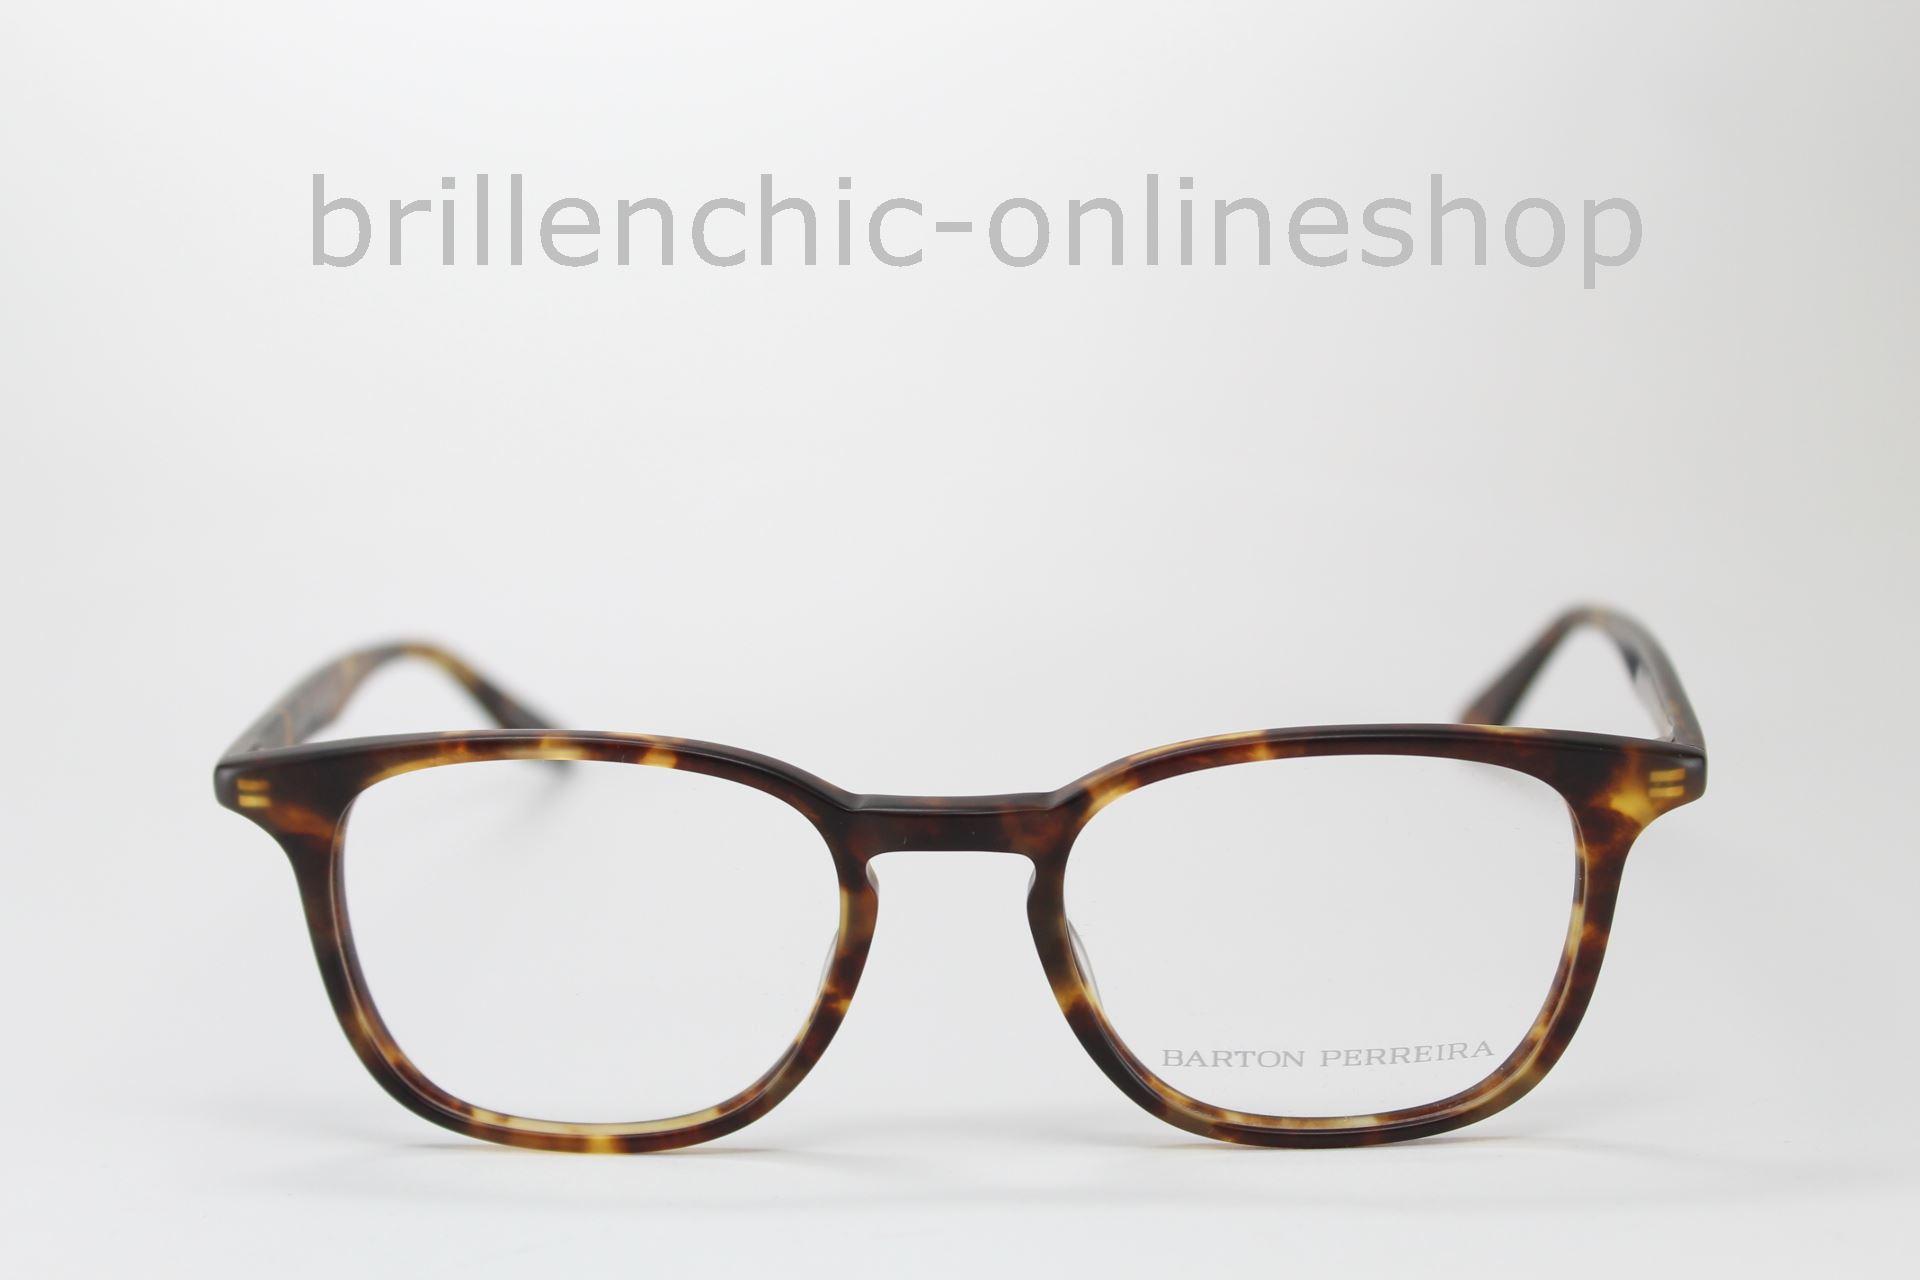 Sportschuhe 800f8 f060f Brillenchic-onlineshop in Berlin - BARTON PERREIRA WOODY ...